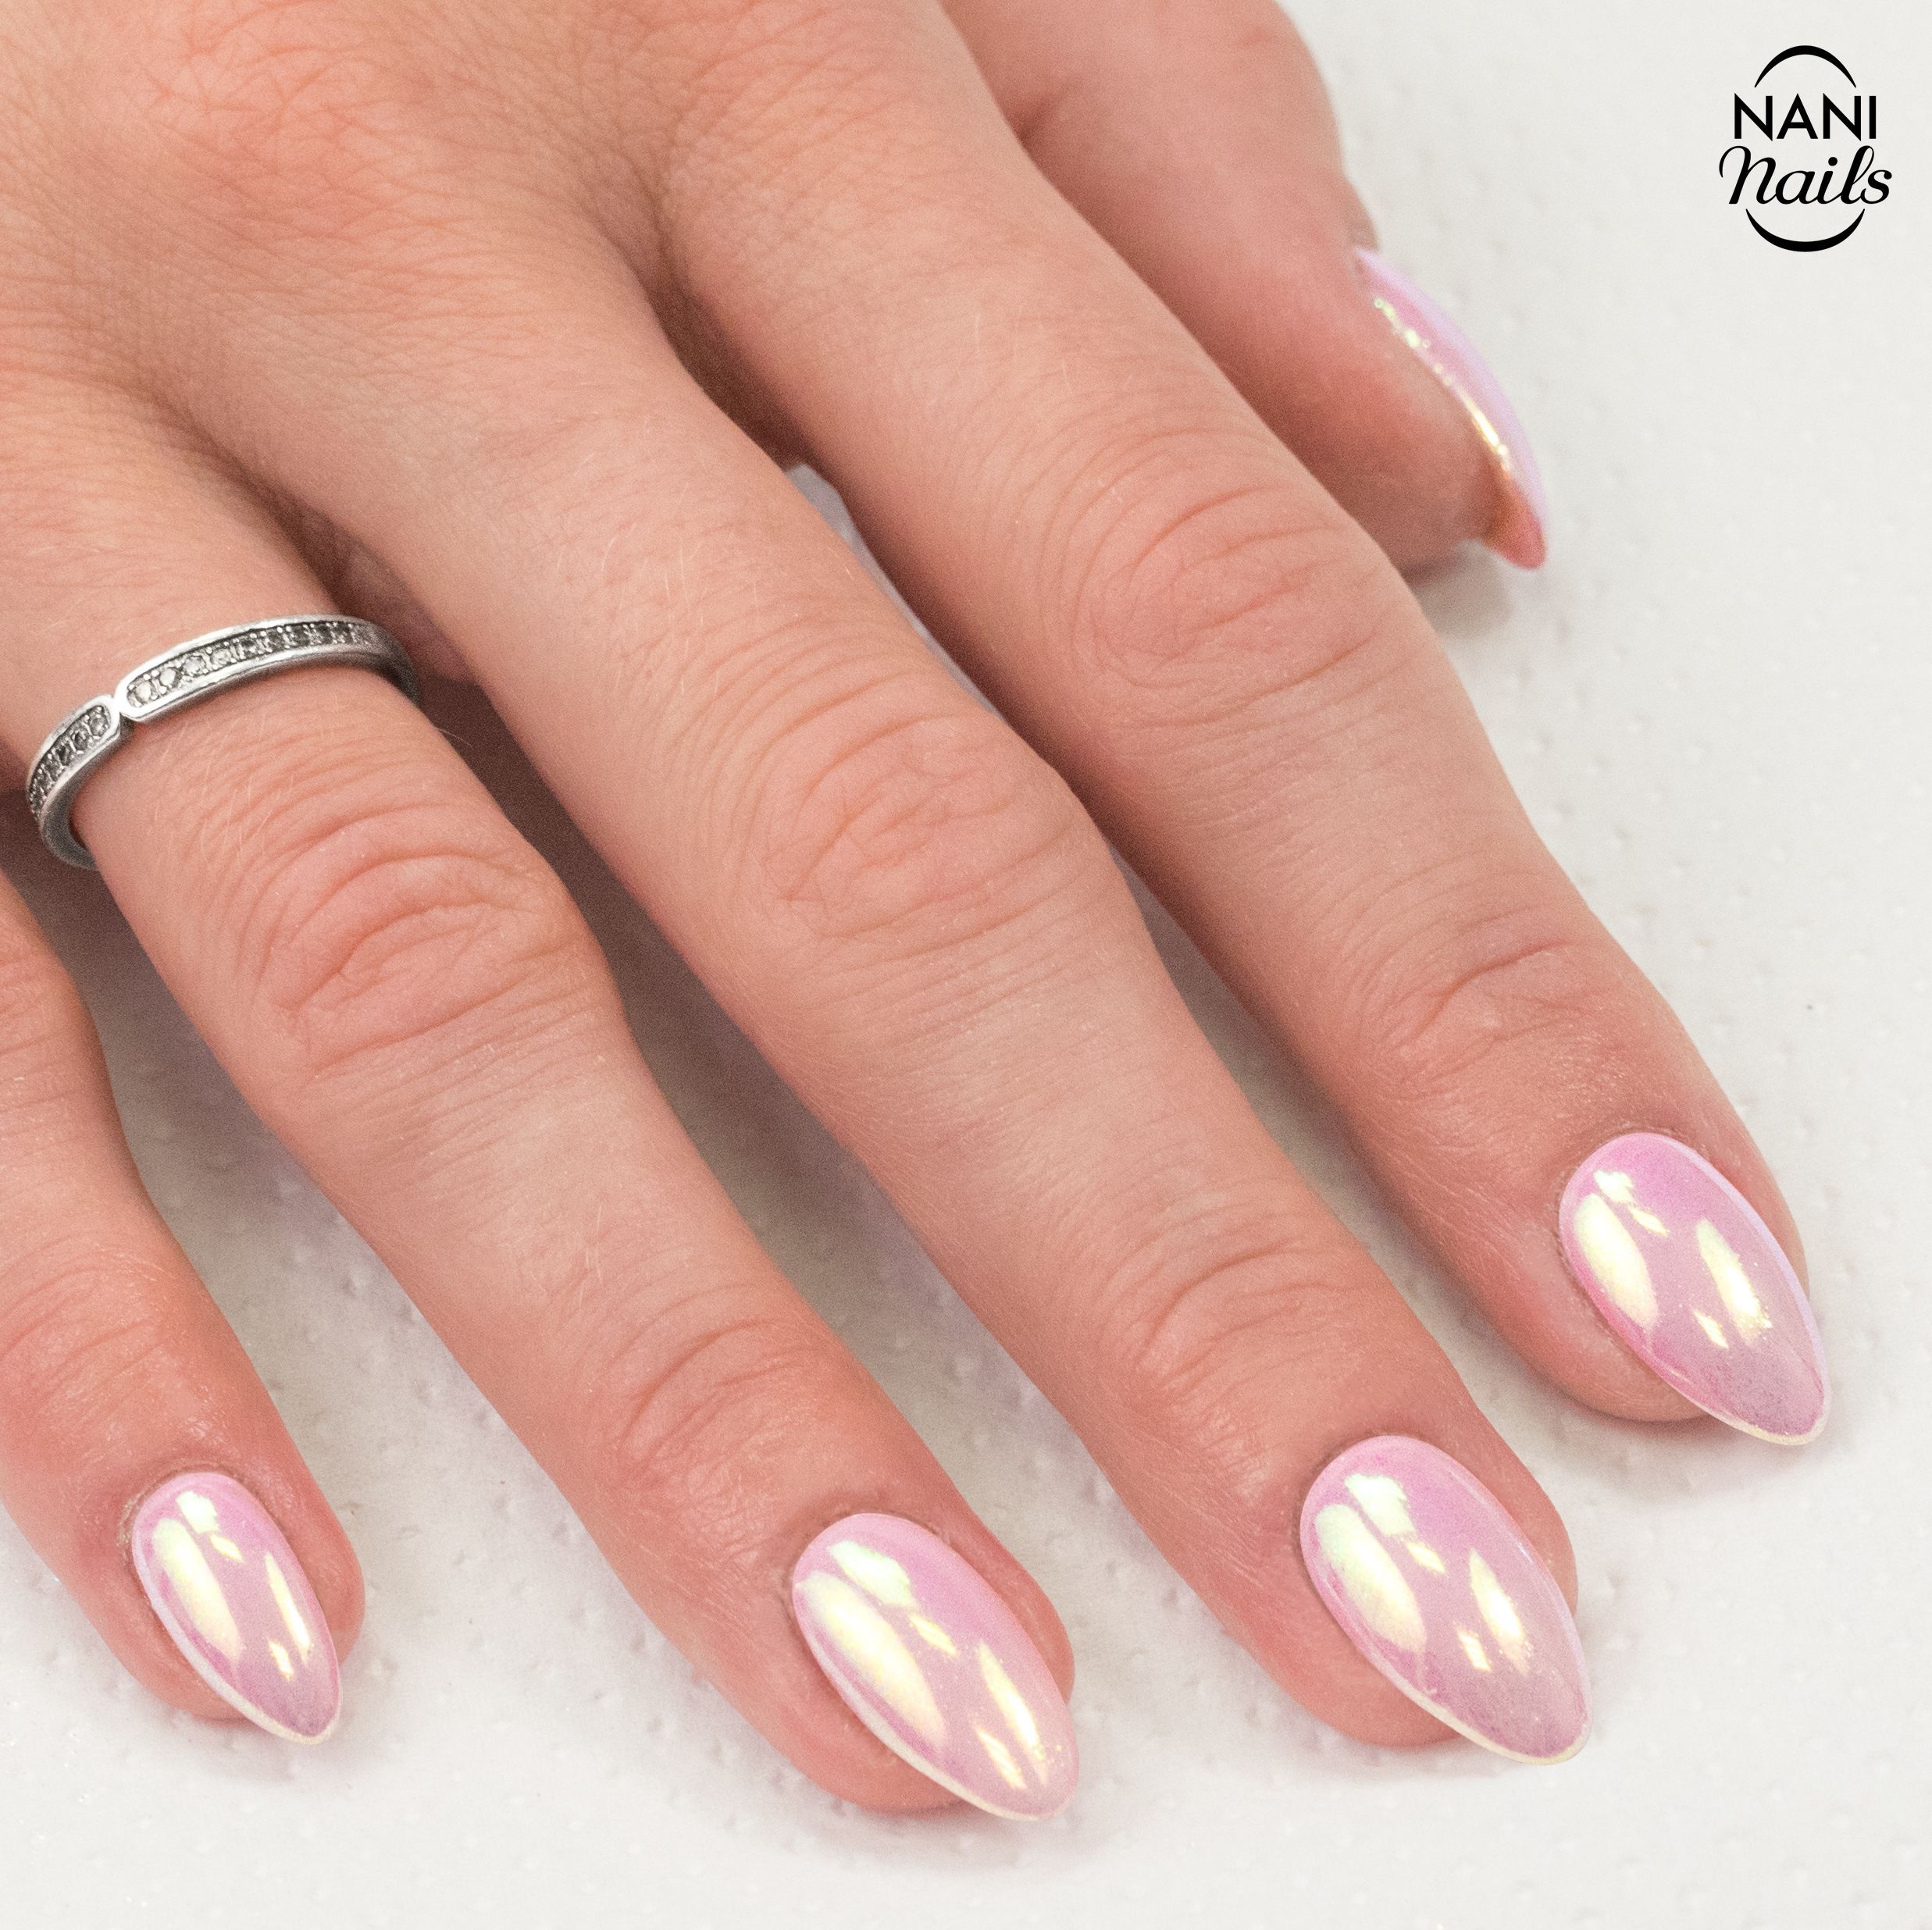 Neonail Lestici Pigment Pearl Effect Gelove Nehty Manikura Nehet